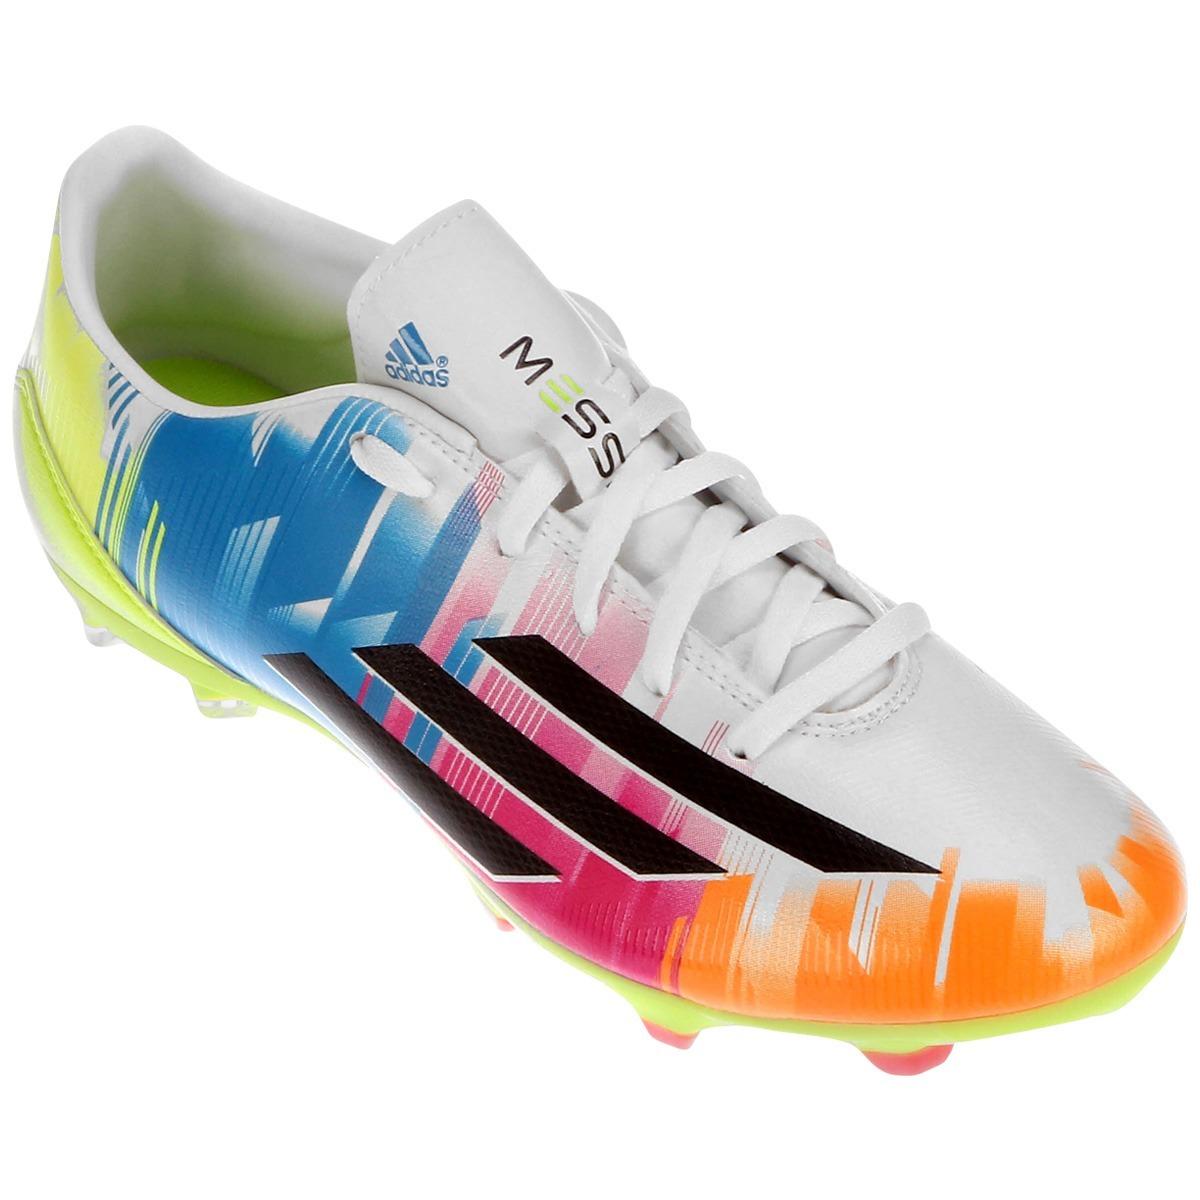 new styles d47e8 0aa42 chuteira campo adidas f10 trx fg messi top. Carregando zoom.